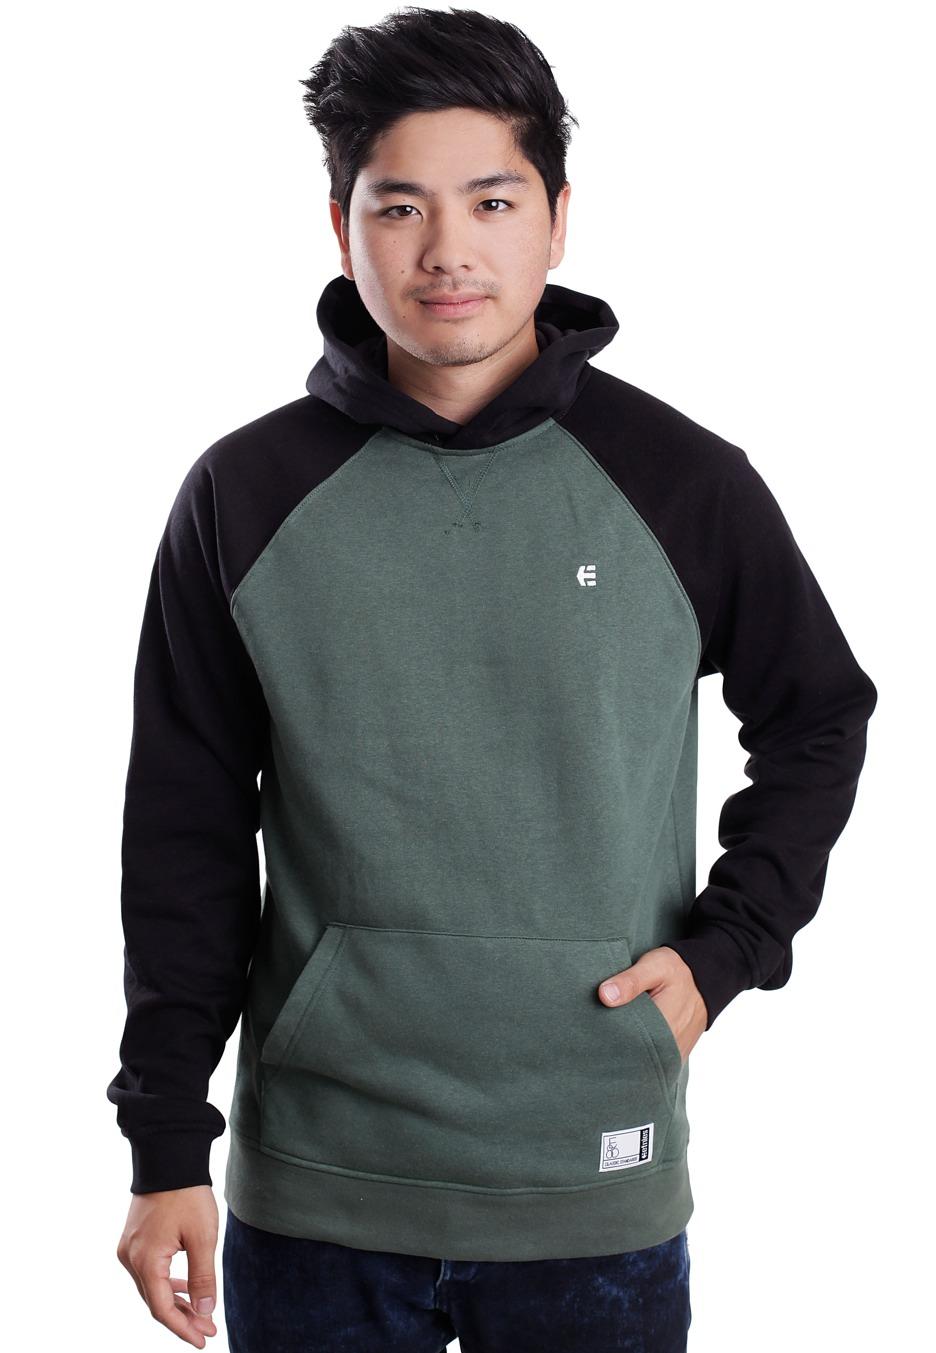 Black and green hoodie